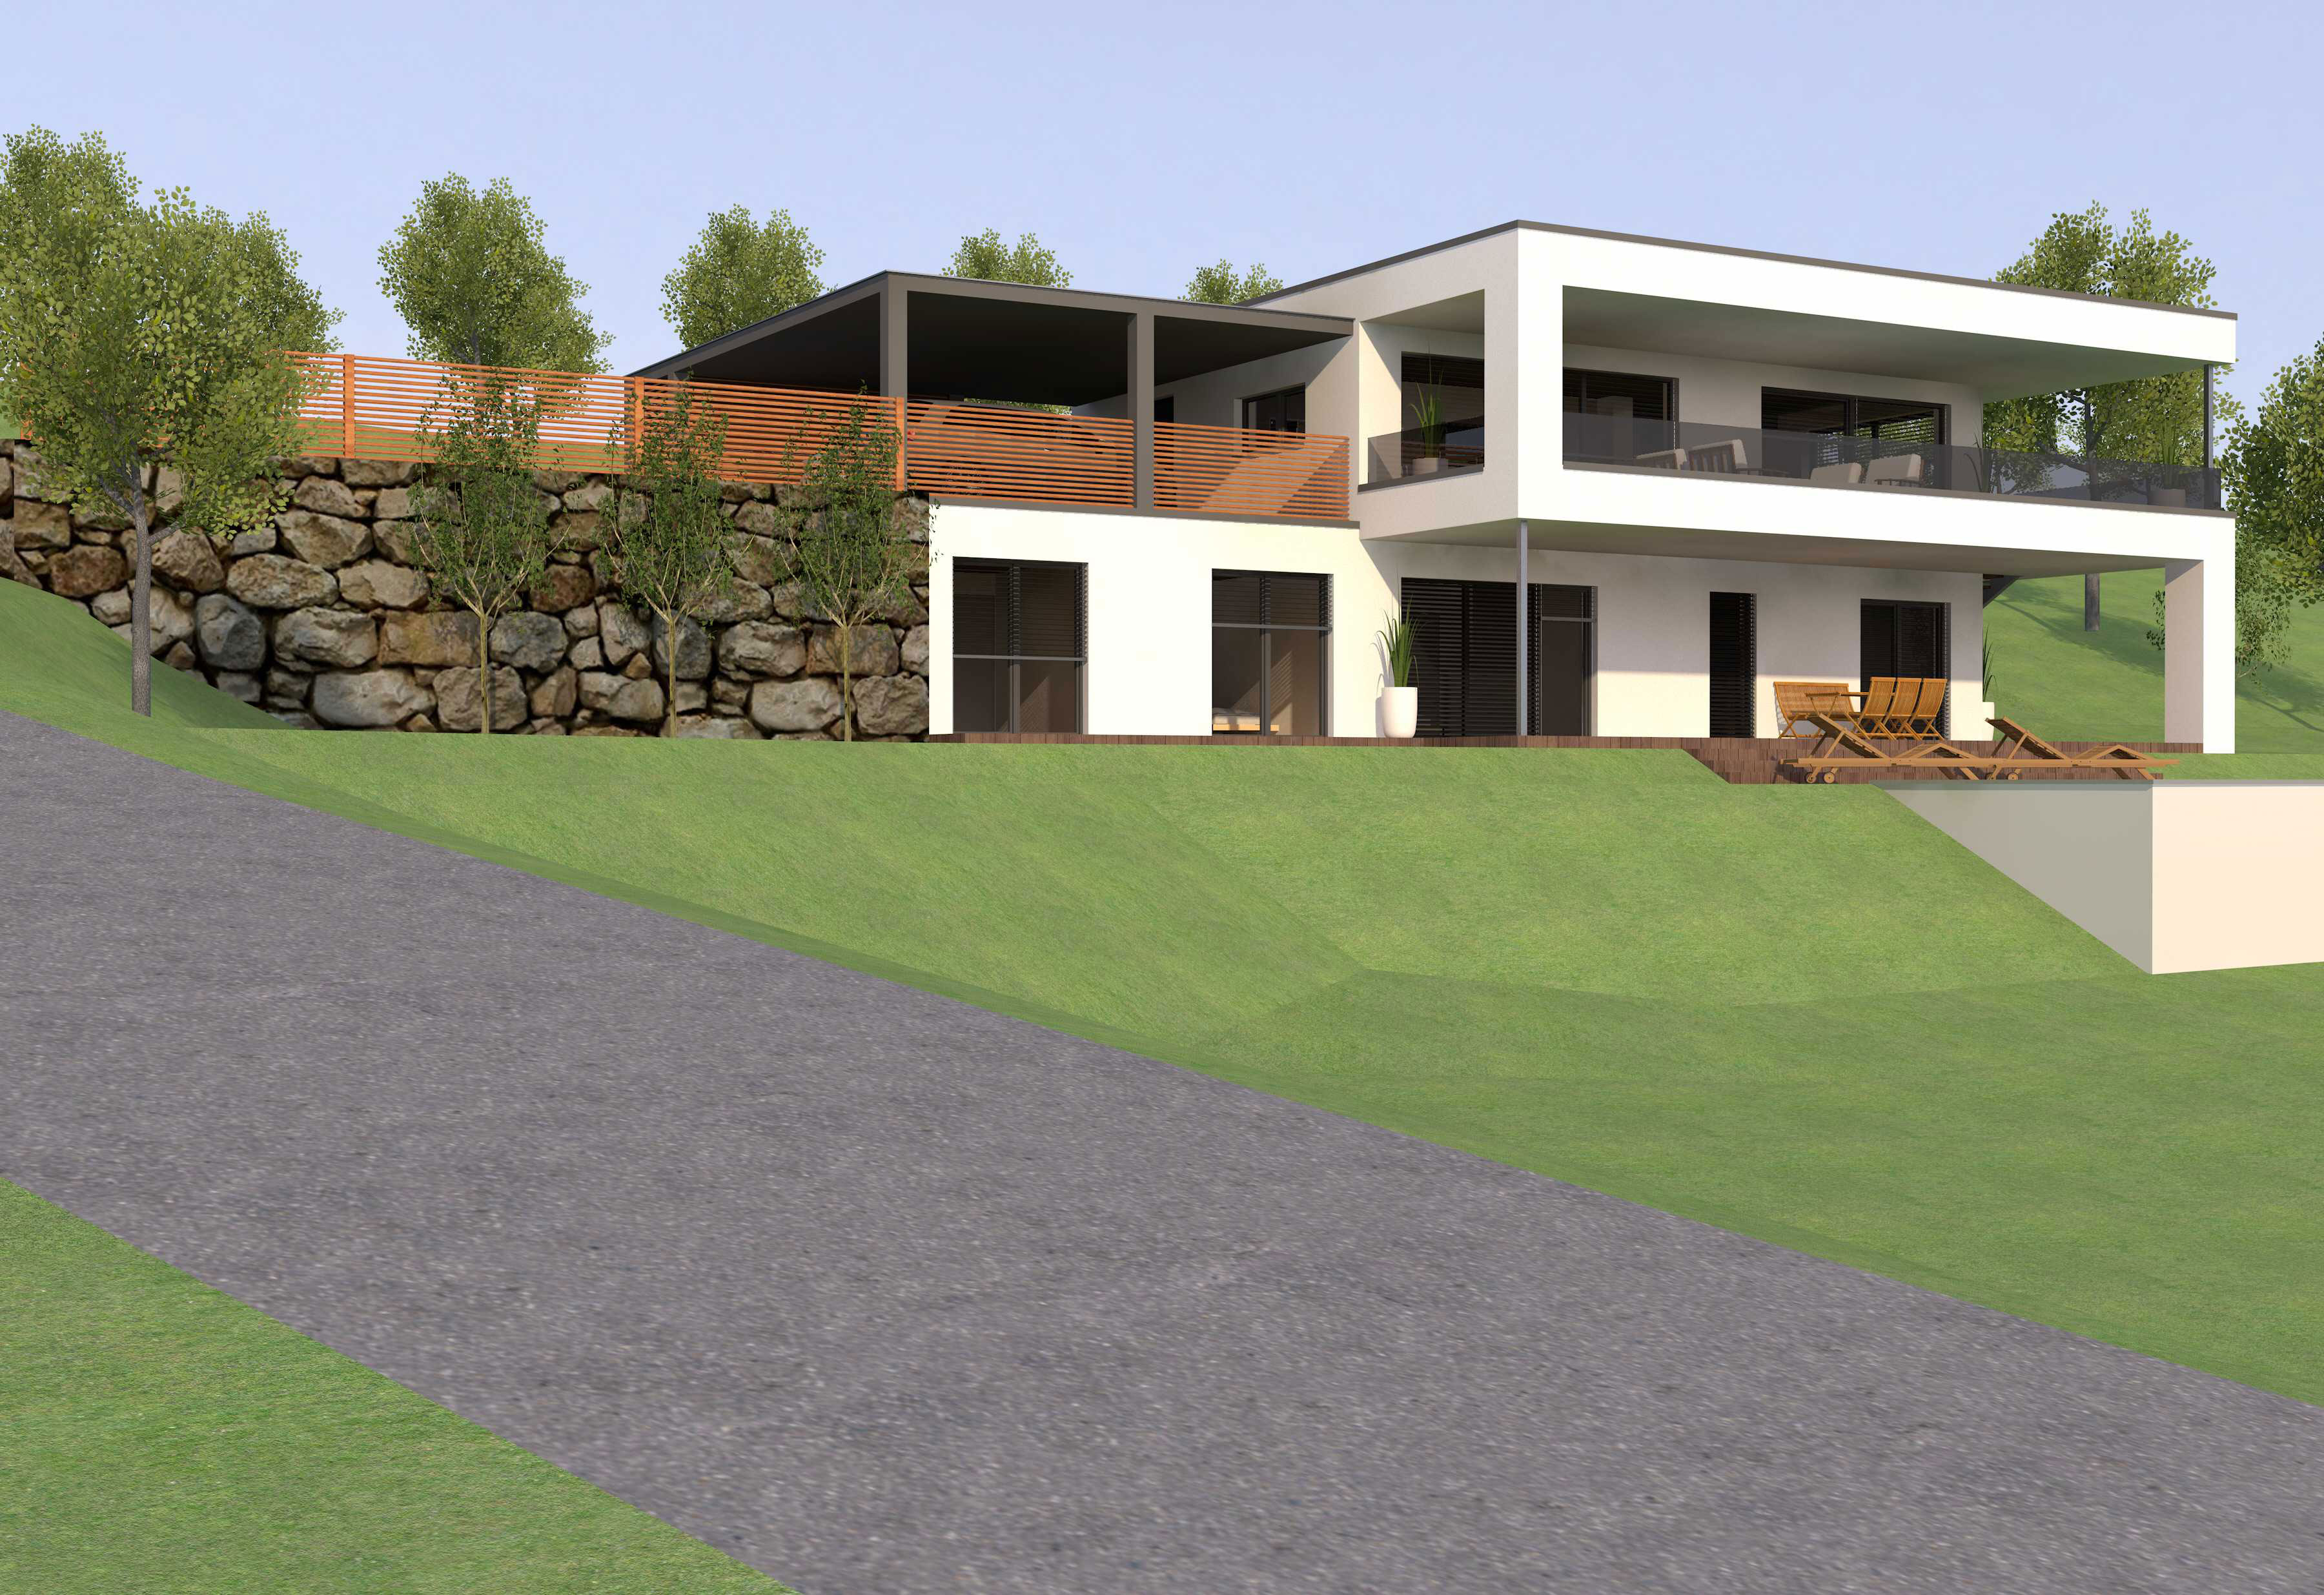 garagentore bamberg design ideen und inspiration garagen ideen garagentor. Black Bedroom Furniture Sets. Home Design Ideas